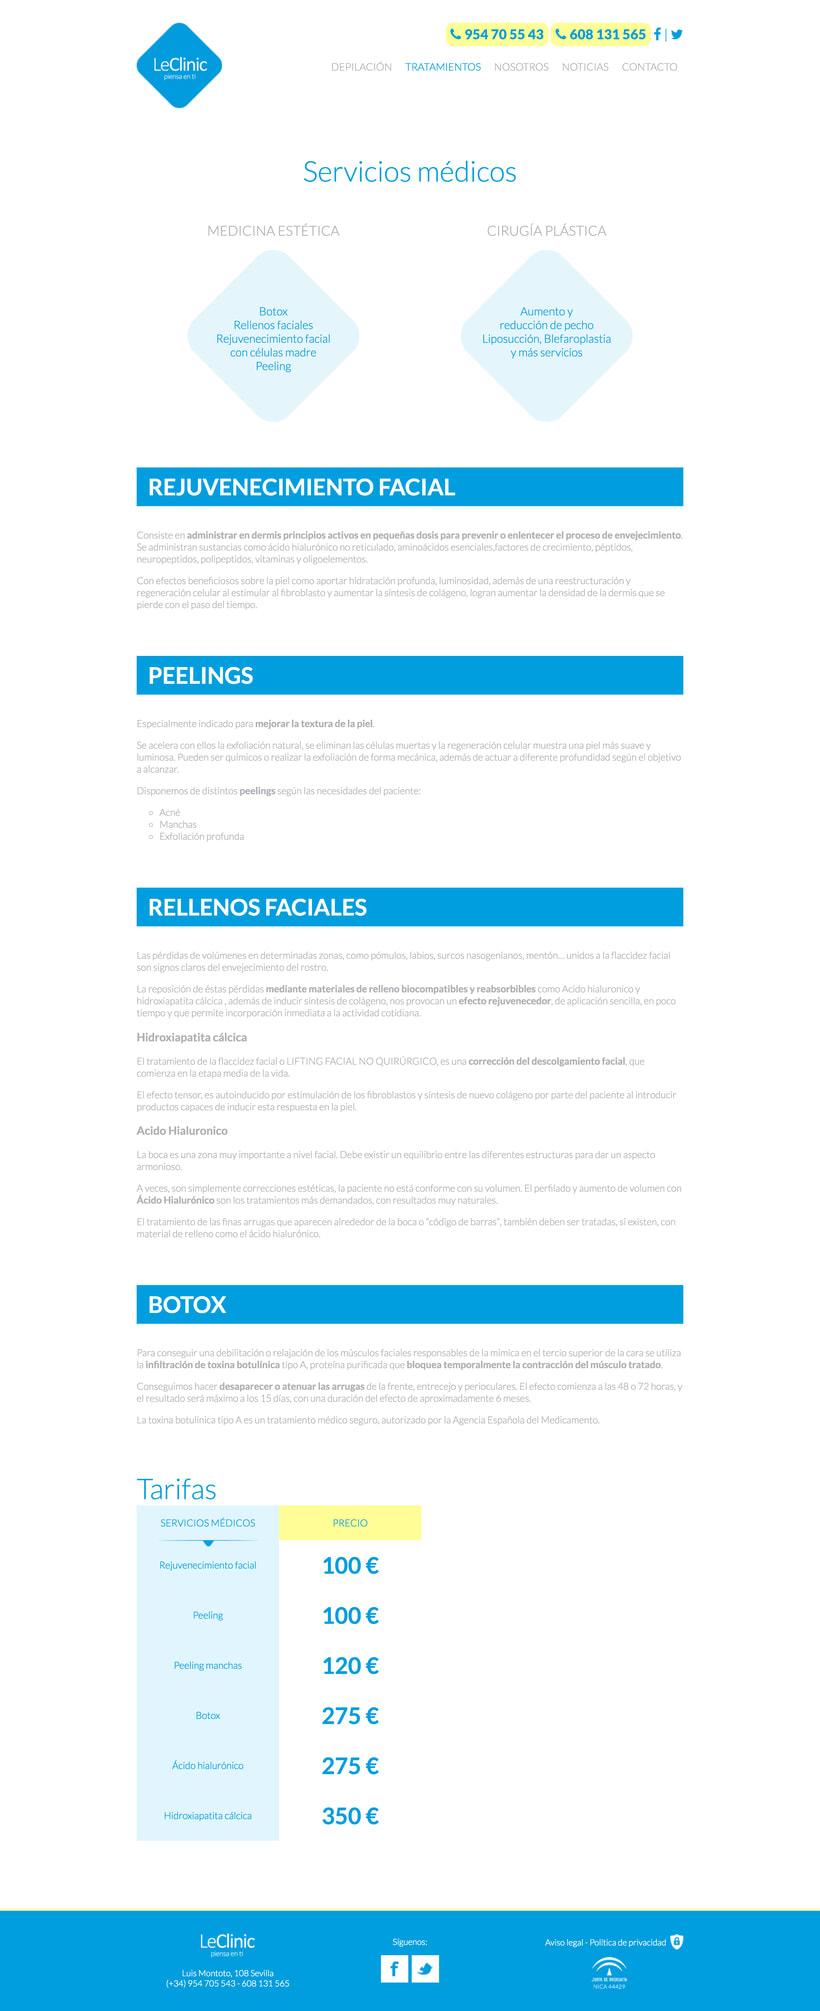 Diseño/Desarrollo Web/UI/UX: LeClinic 5